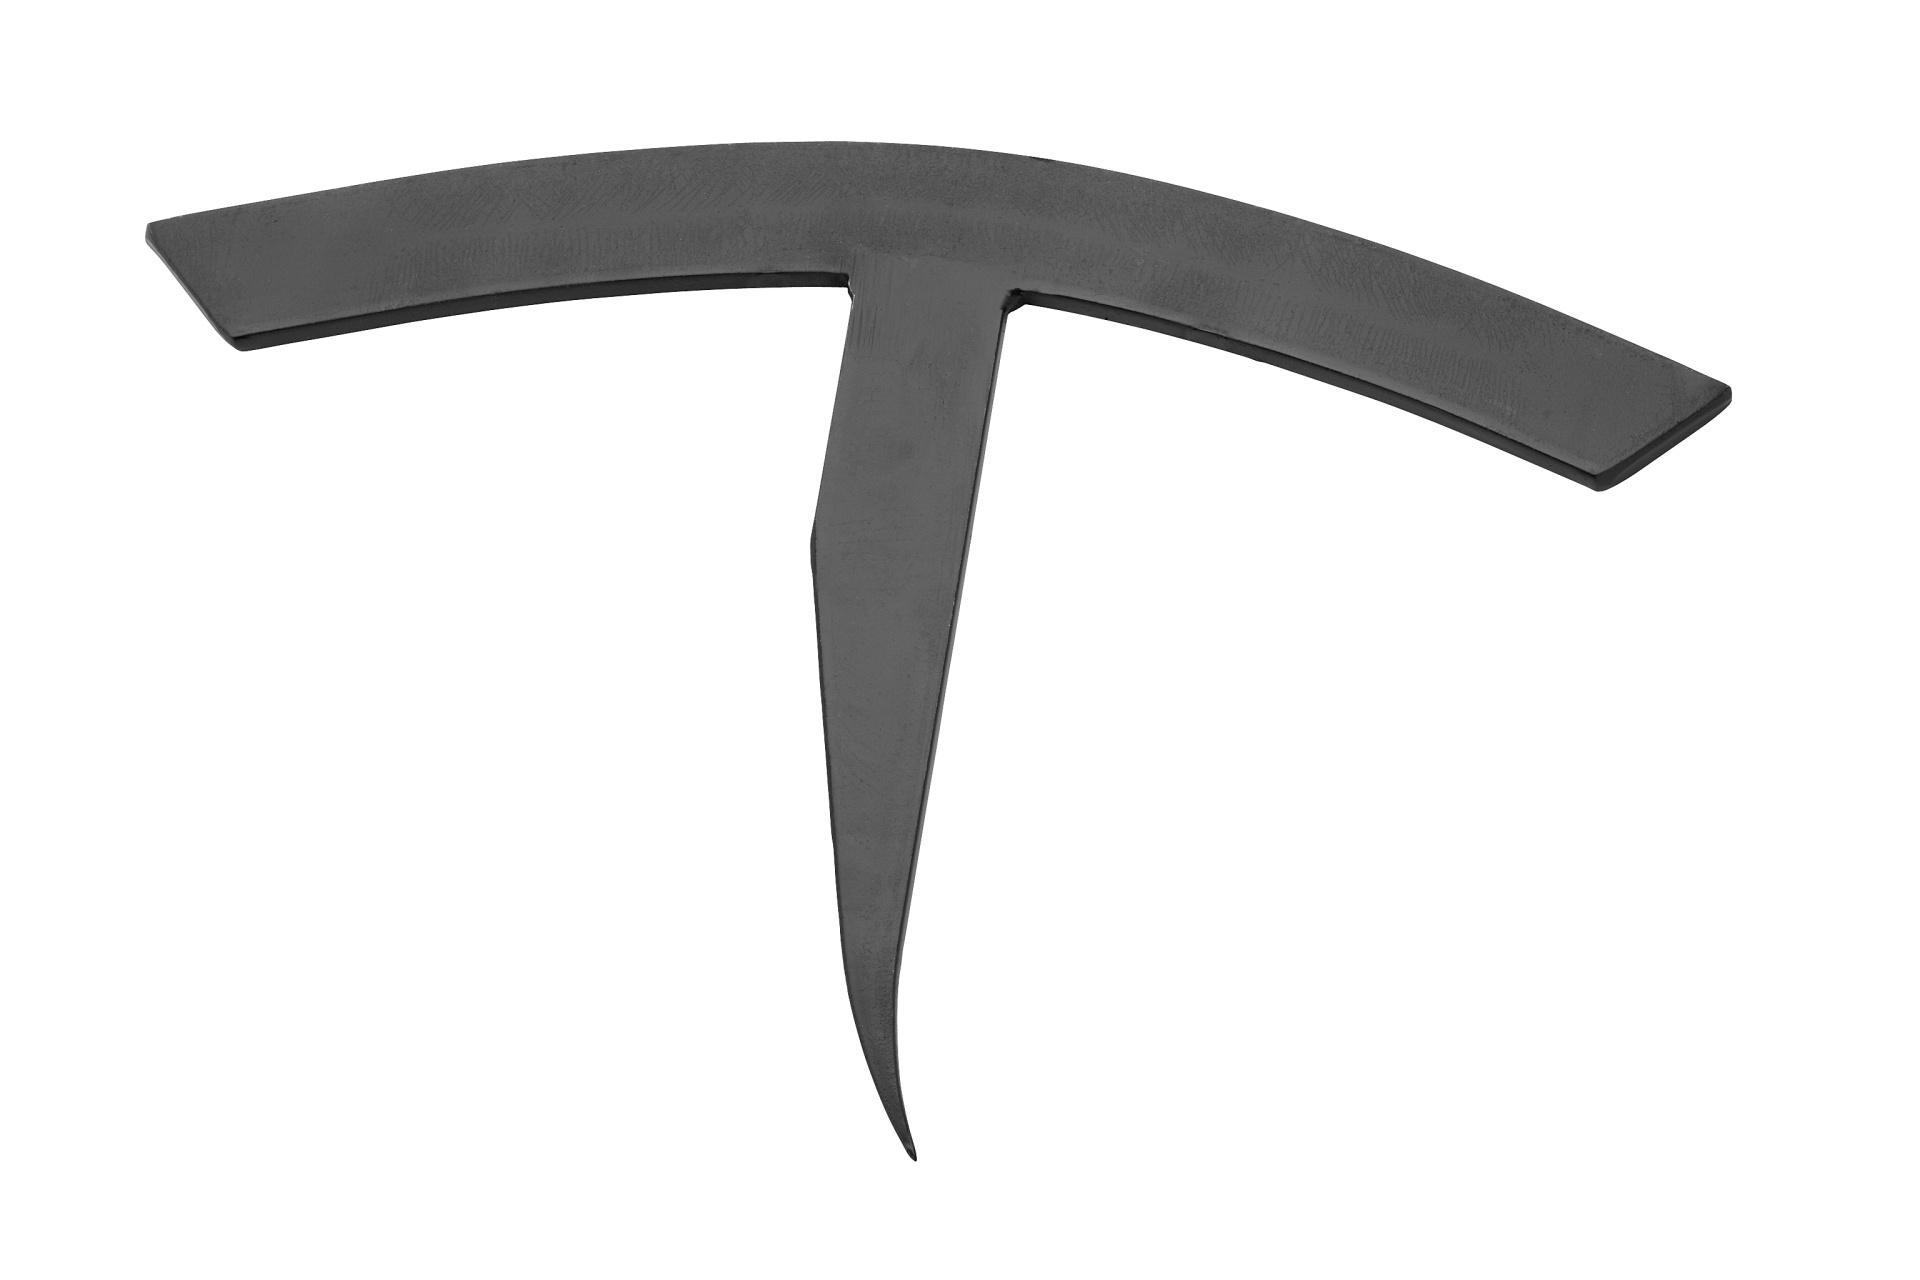 Schieferhaubrücke, gebogene Form